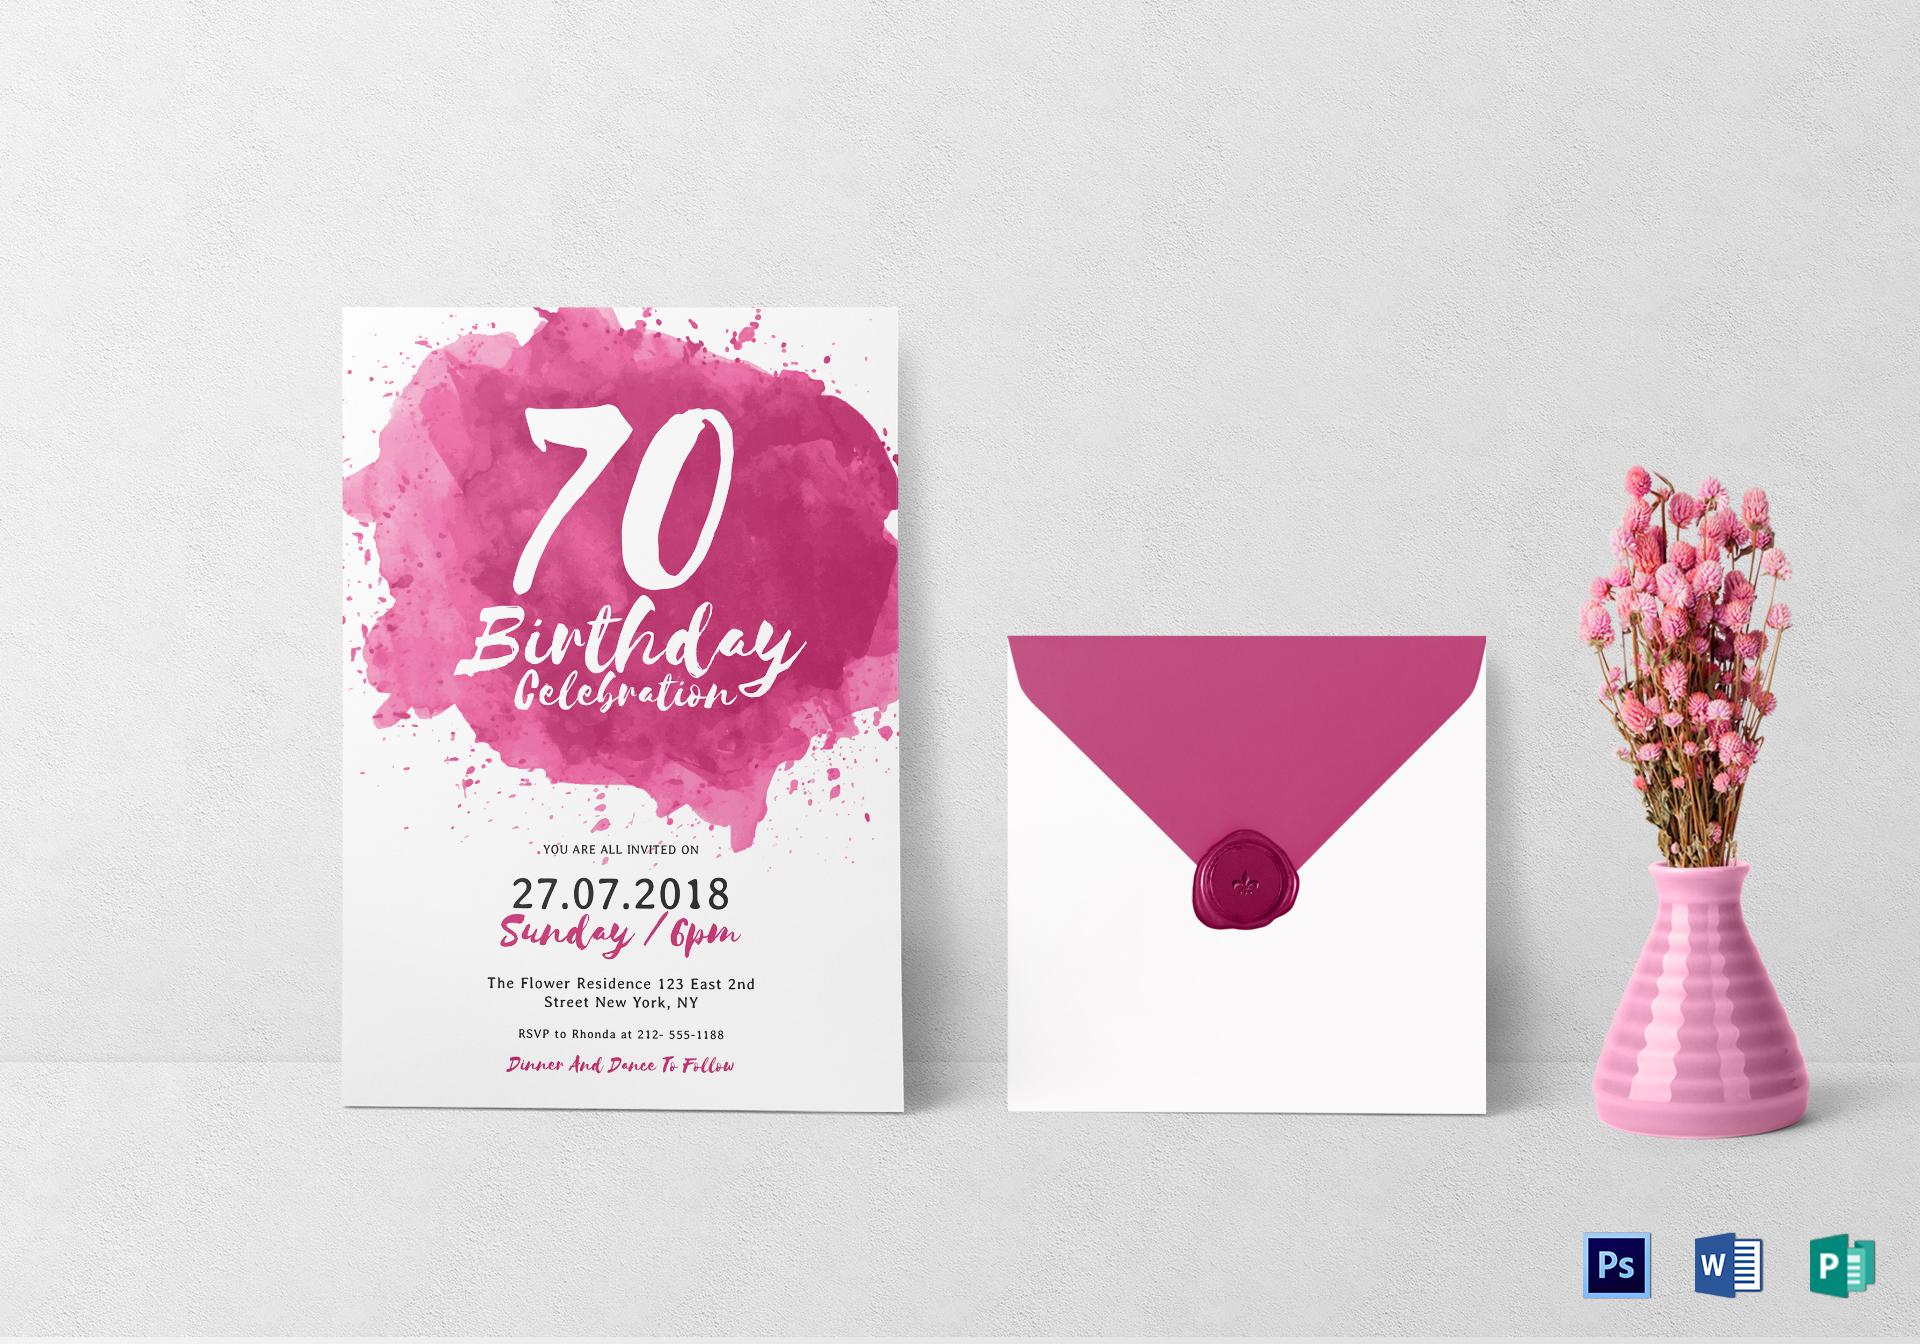 watercolor birthday celebration invitation layout